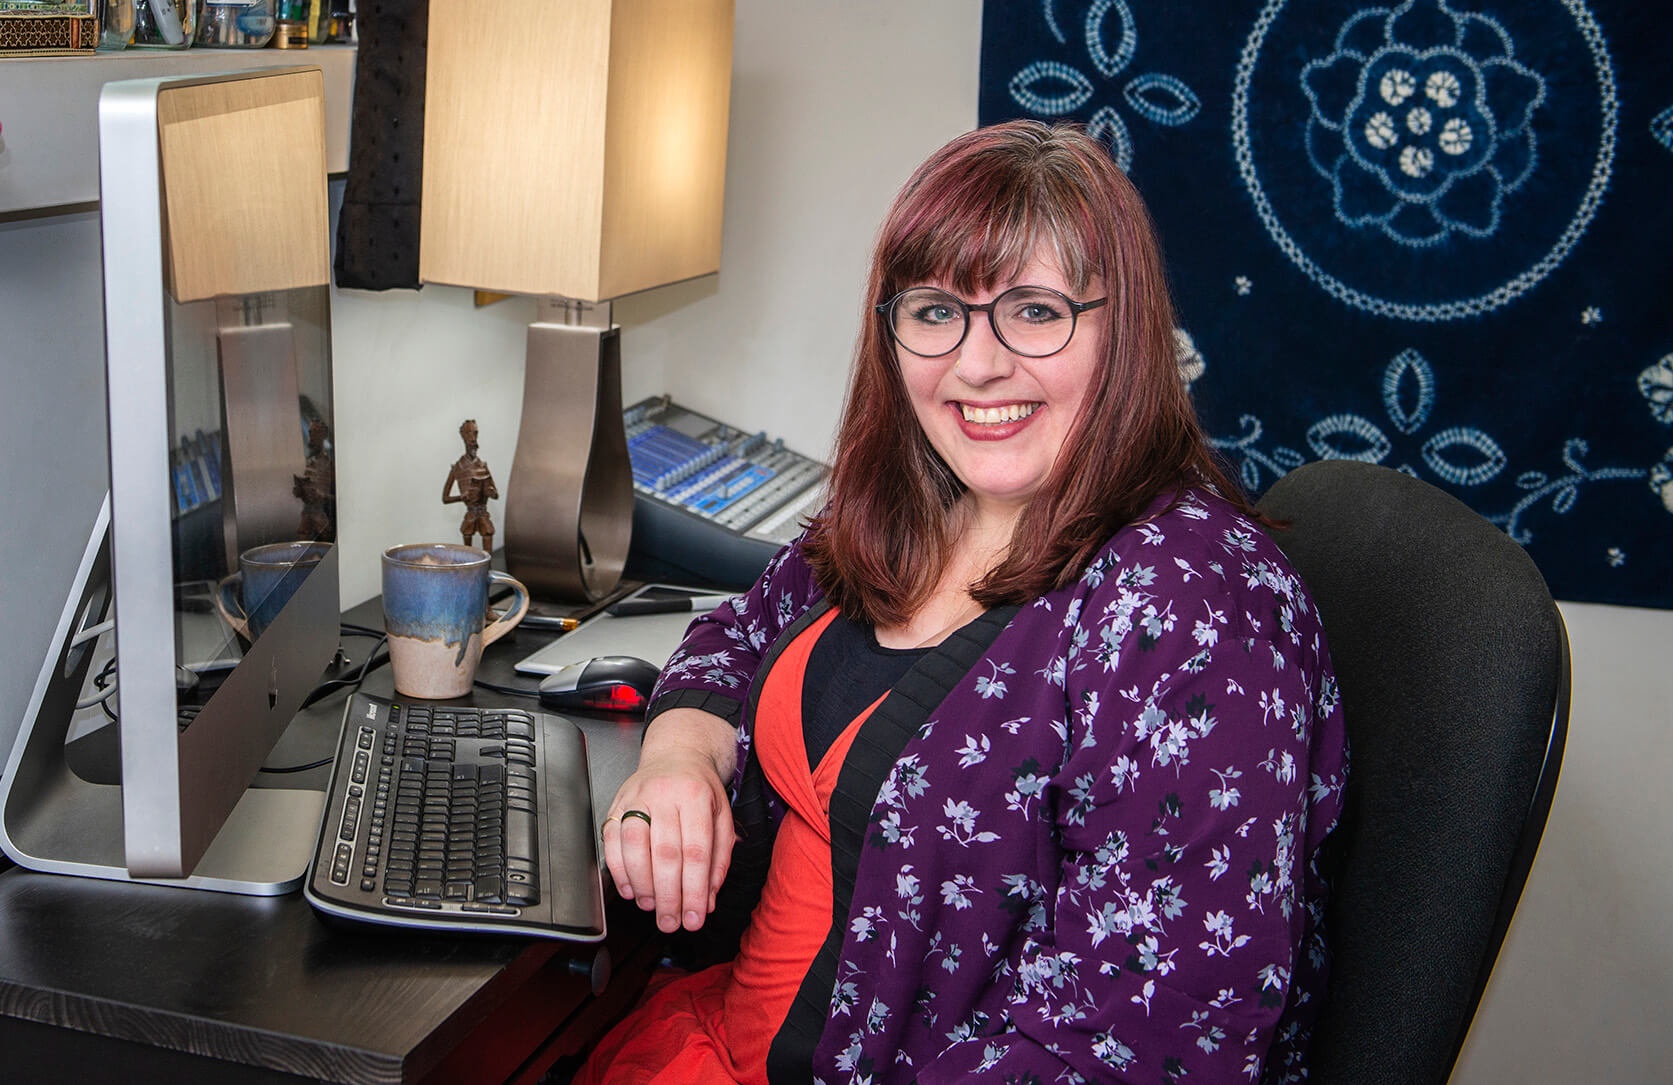 Fiona Smith 2018 Future Alumni Award recipient Athabasca University #AthabascaU AU Online Education #OnlineEd Distance Education Transforming Lives